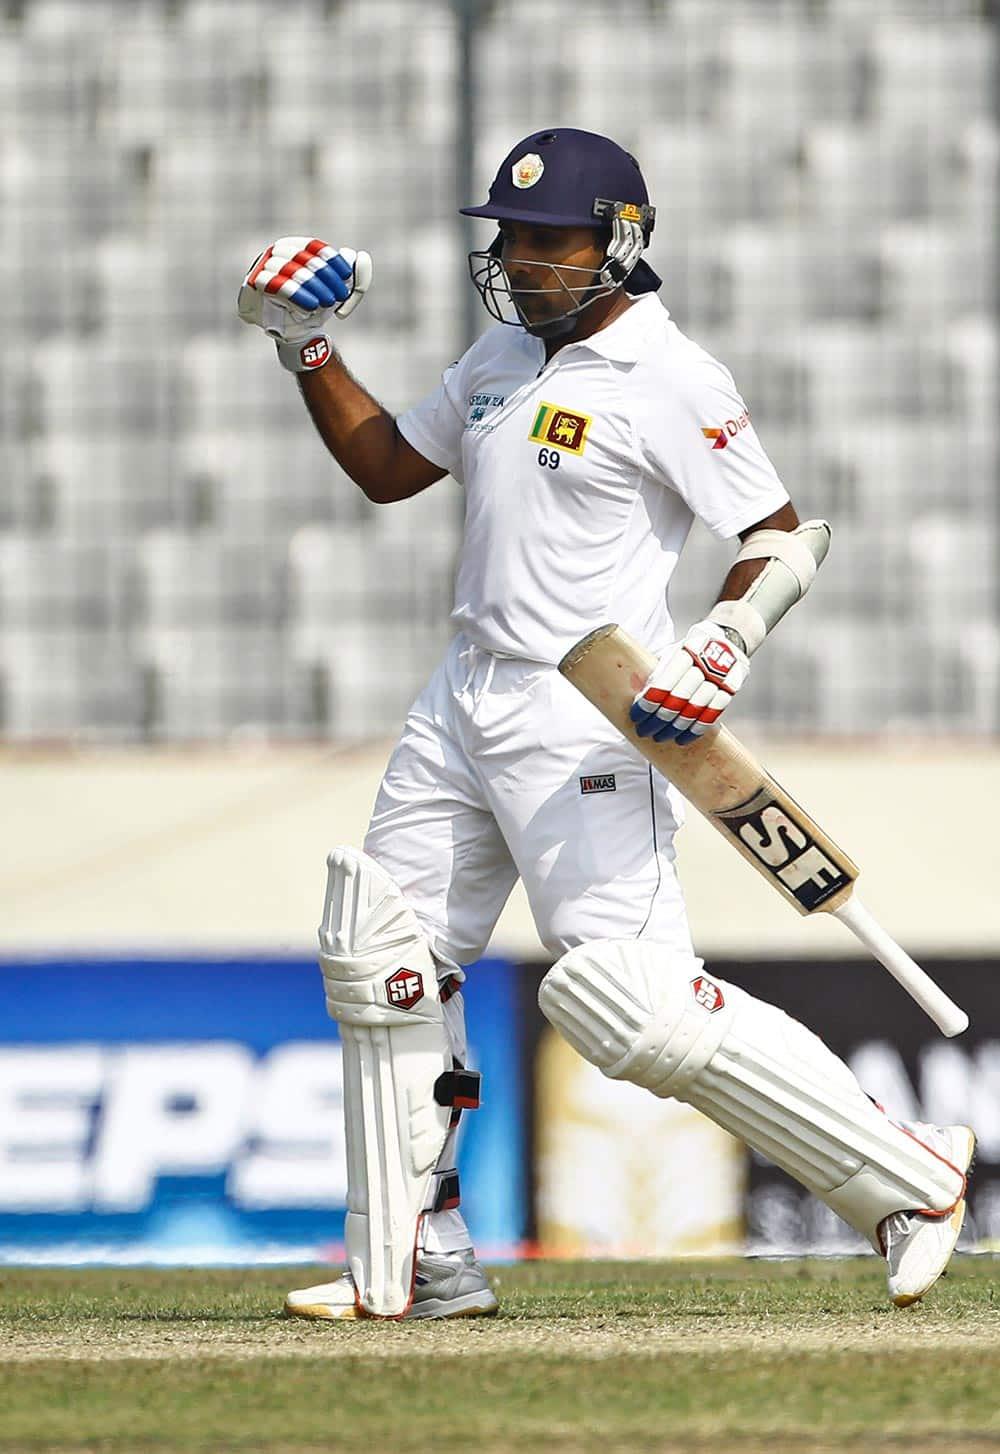 Sri Lanka`s Mahela Jayawardene celebrates after scoring a century on the third day of the first test cricket match against Bangladesh in Dhaka, Bangladesh.